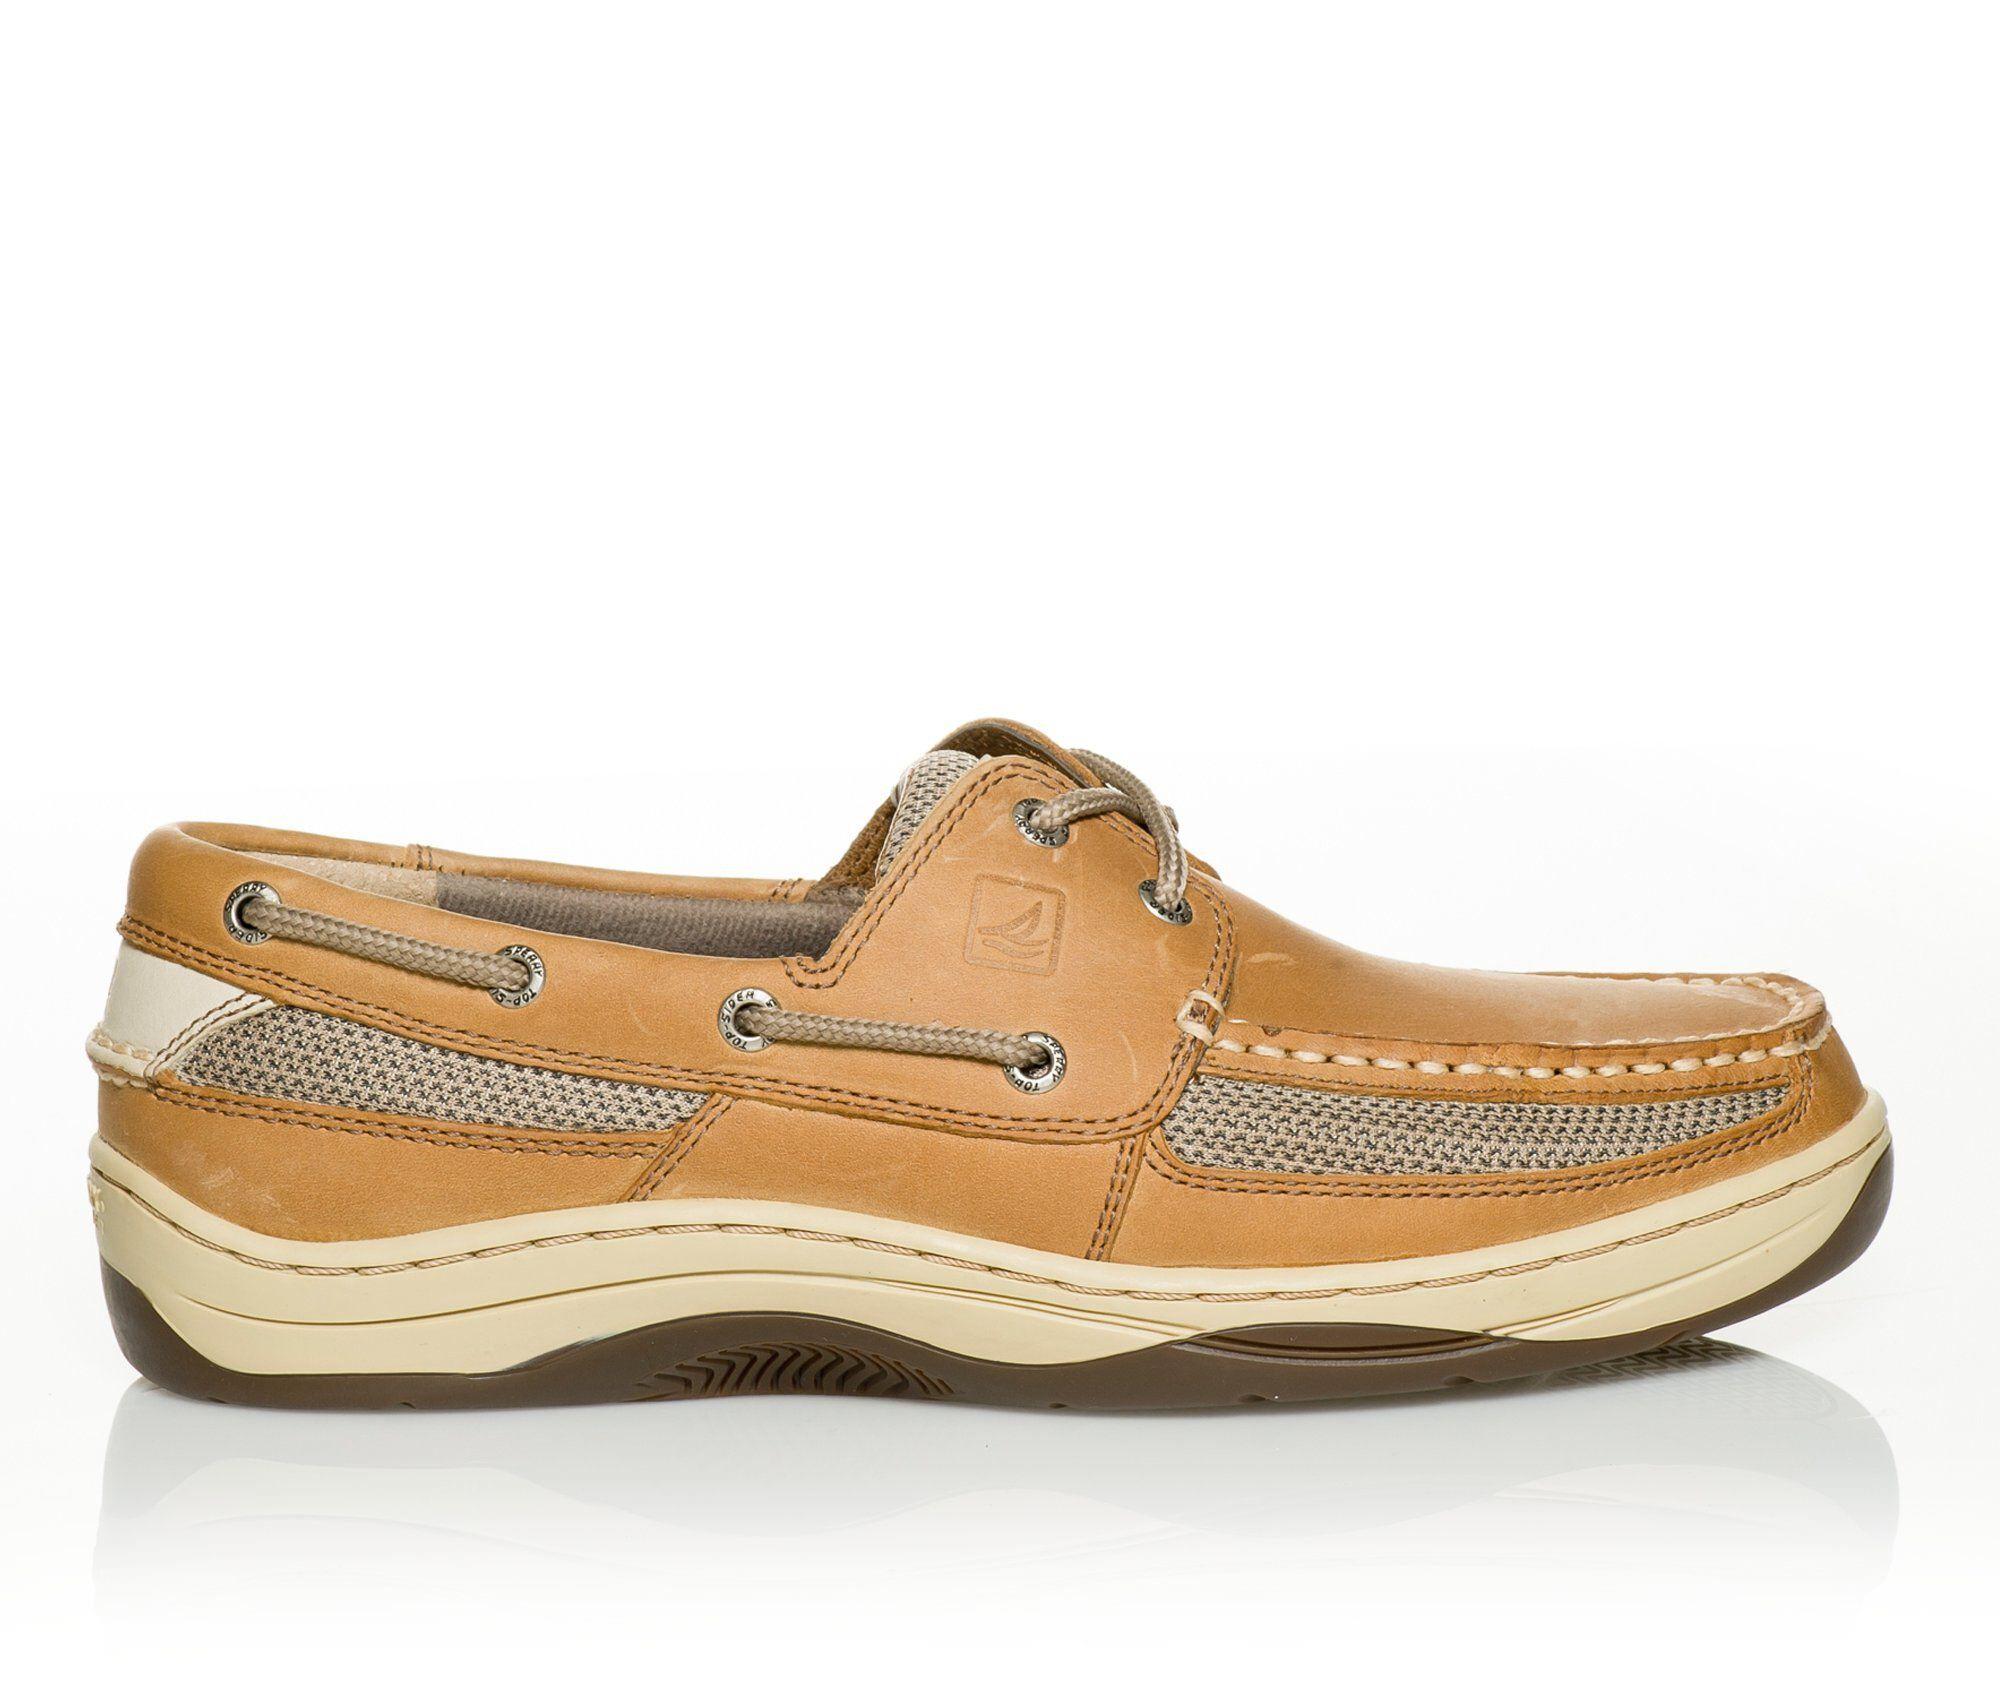 uk shoes_kd2408